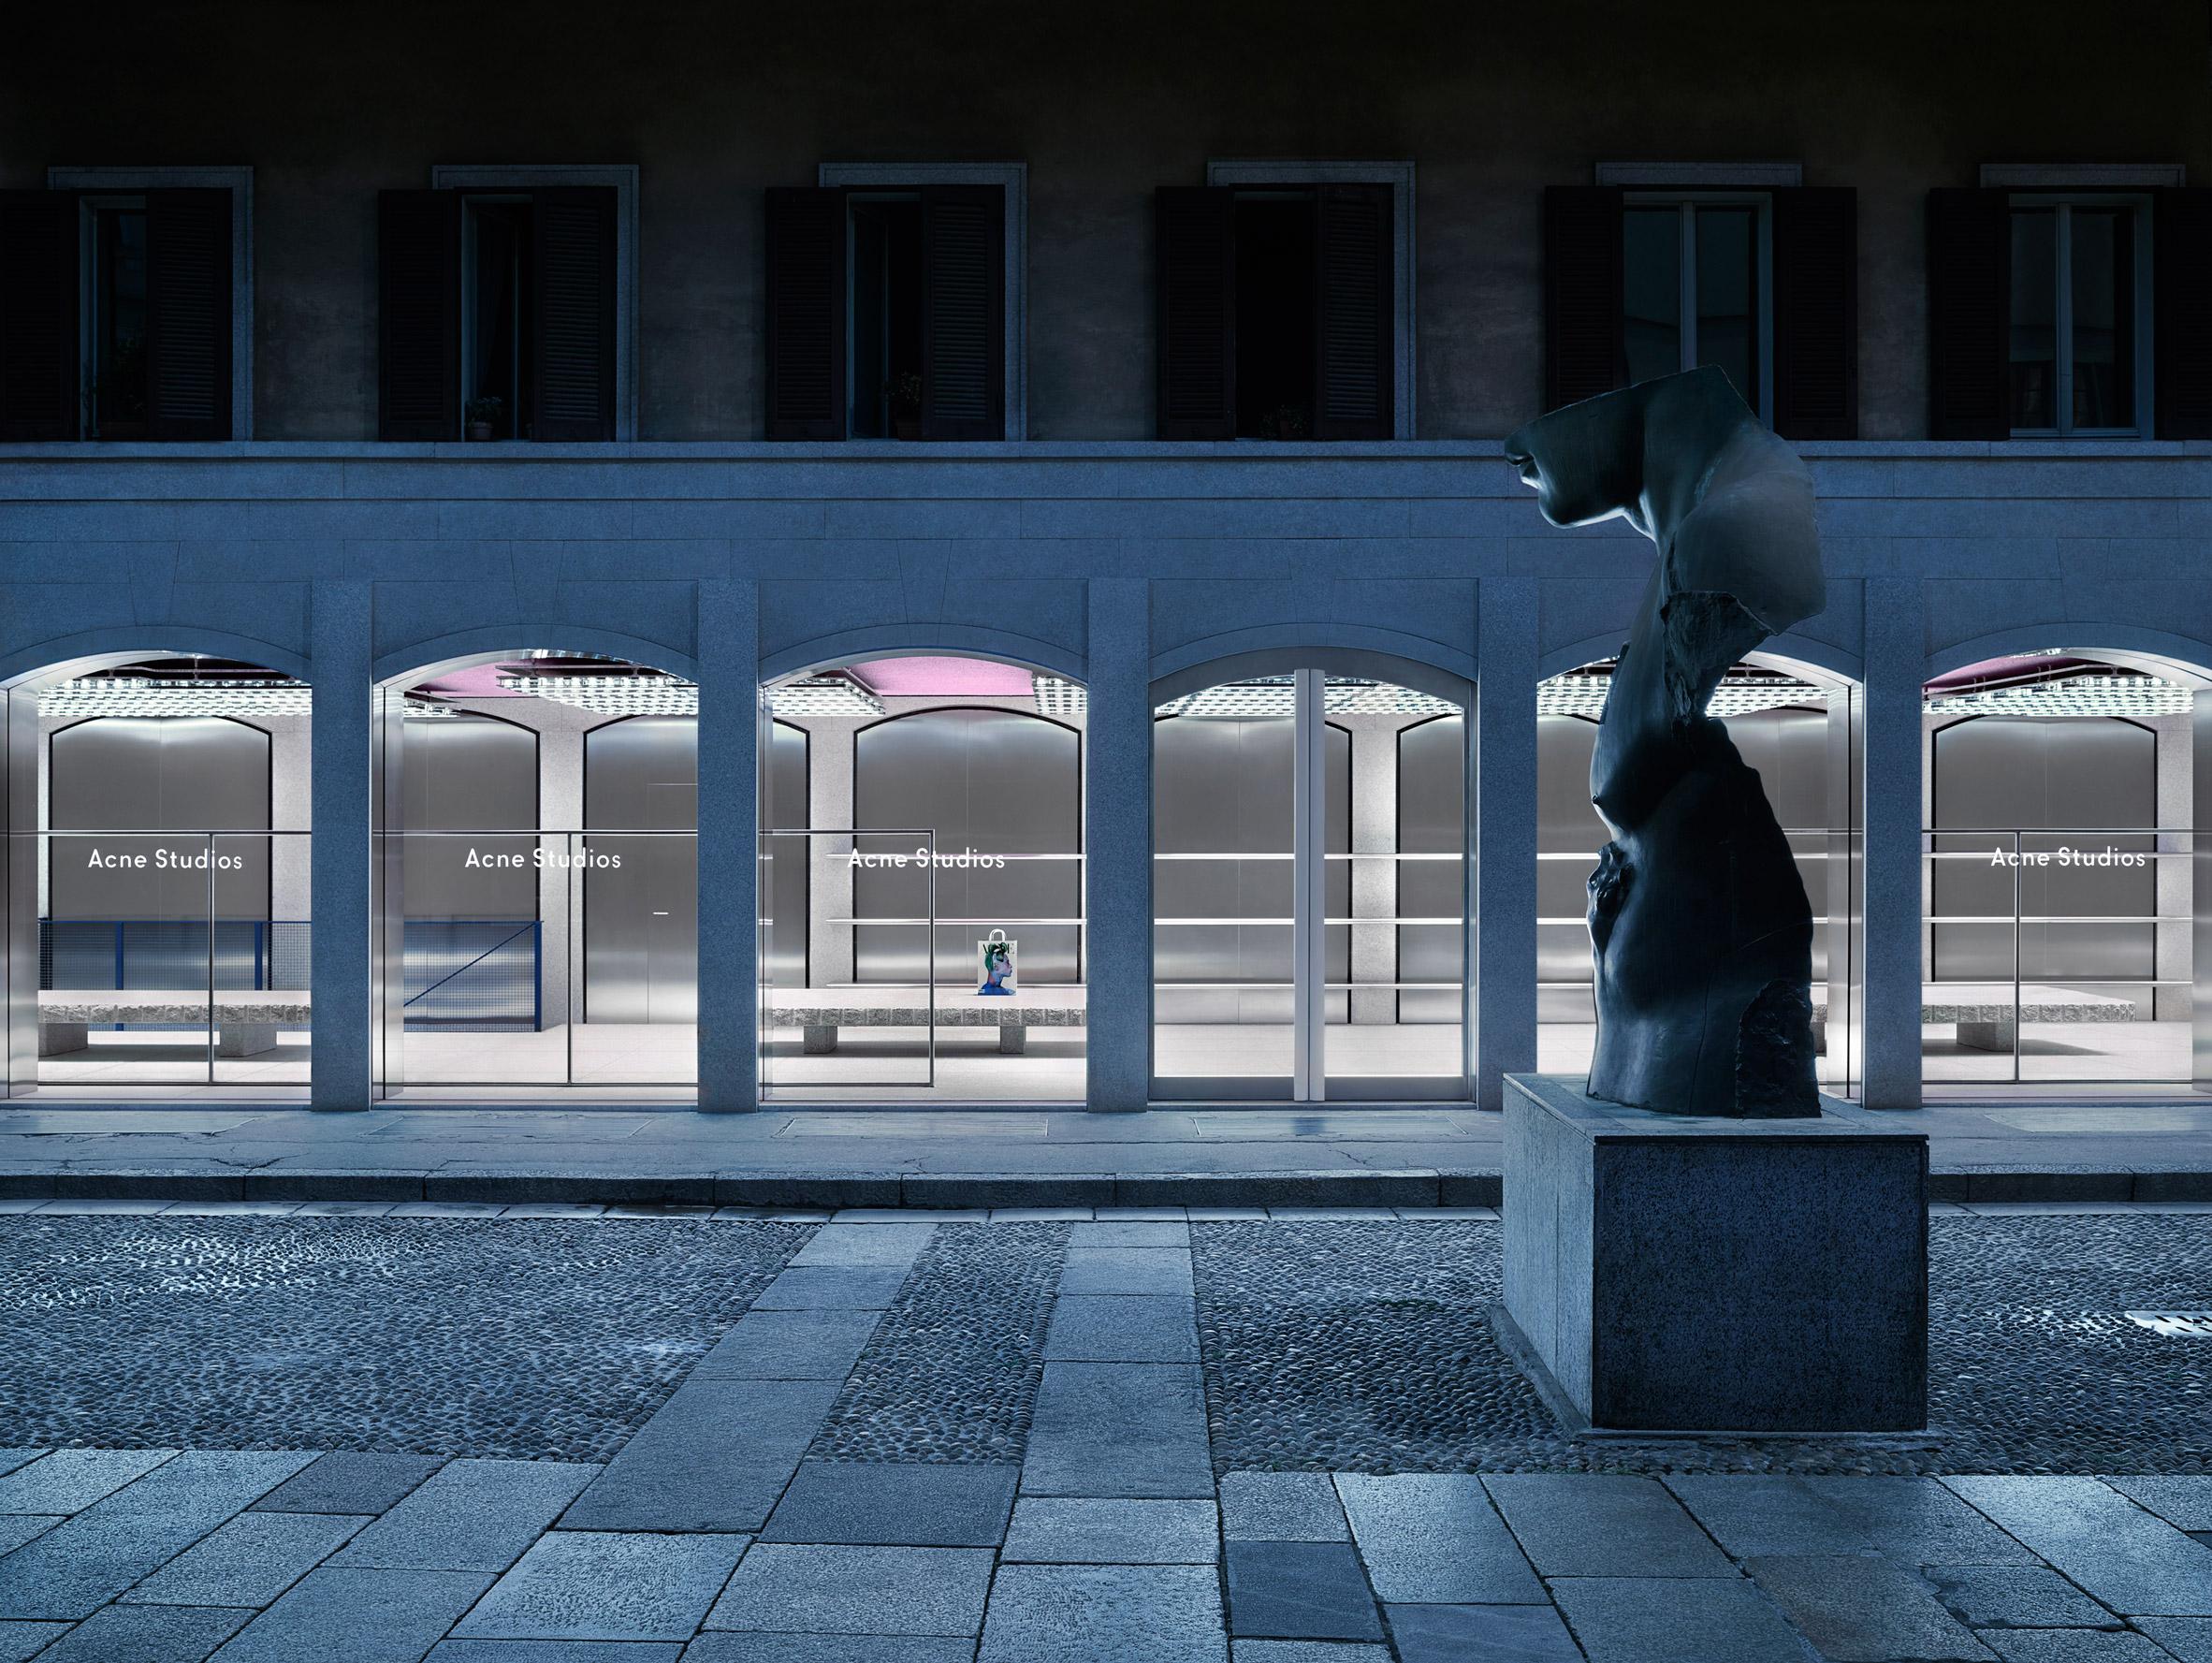 Acne Studios opens flagship in Brera district of Milan